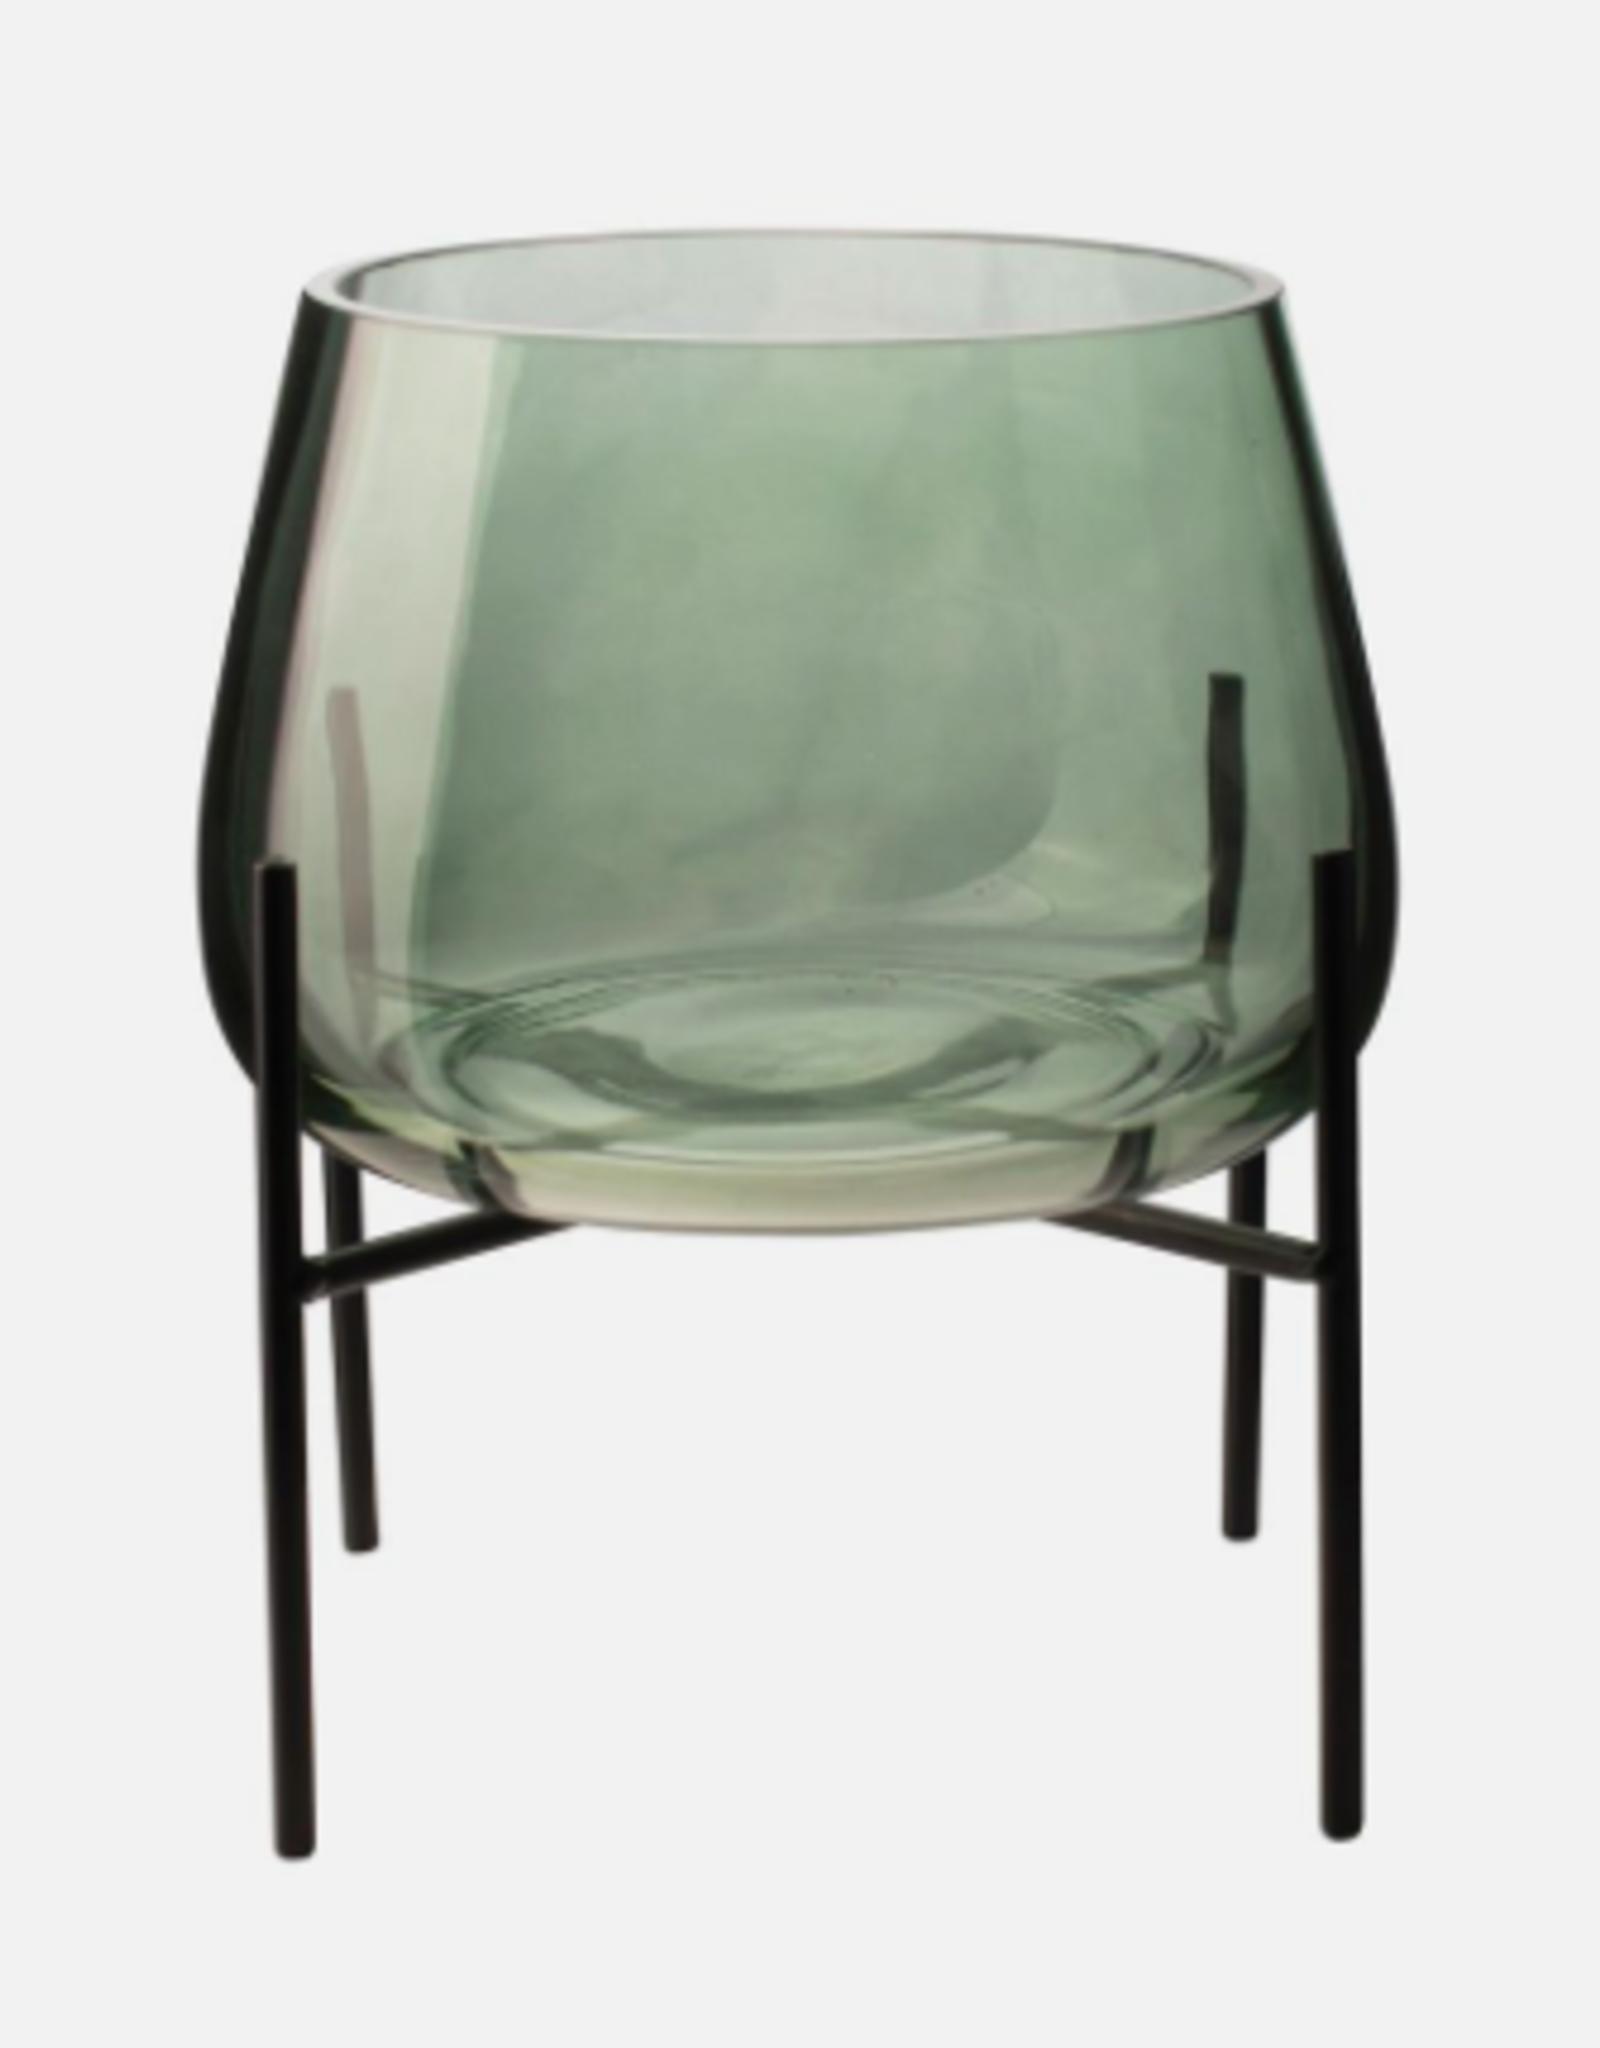 Gusta Gusta - Glazen vaas groen met standaard